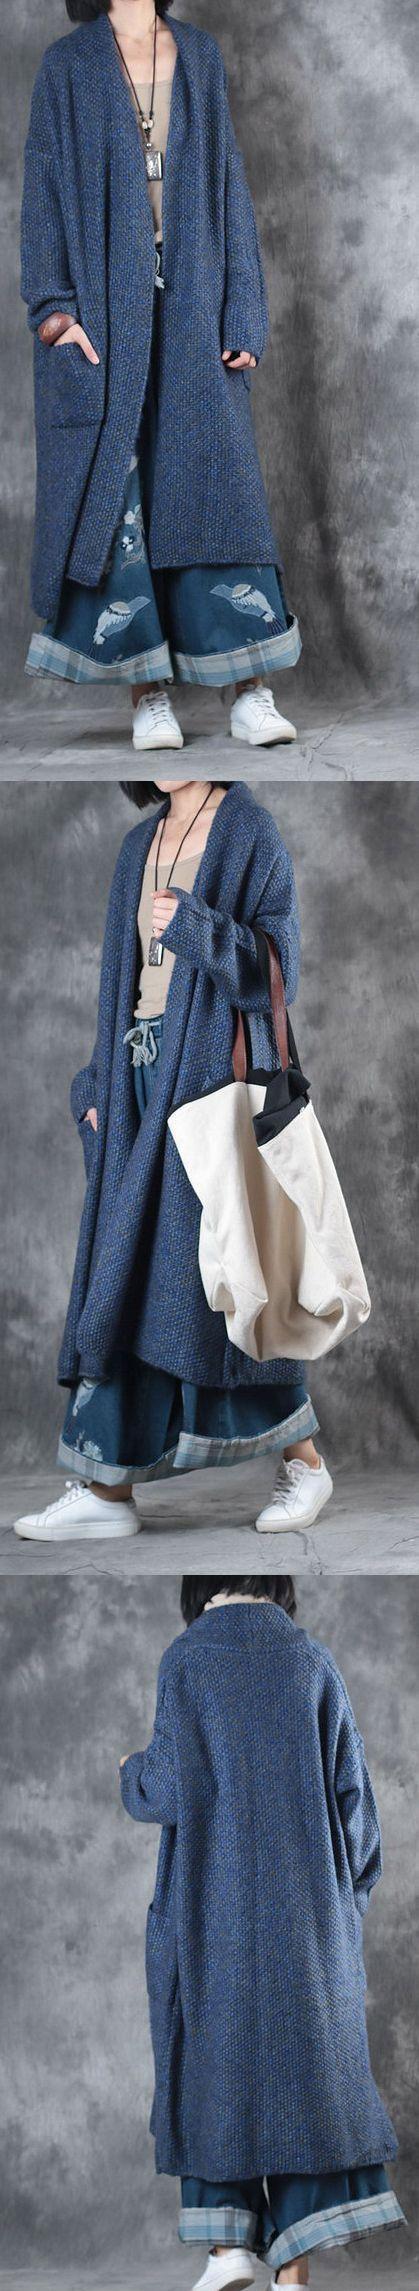 2017 new blue plus size woolen cardigan trendy sweater winter coat